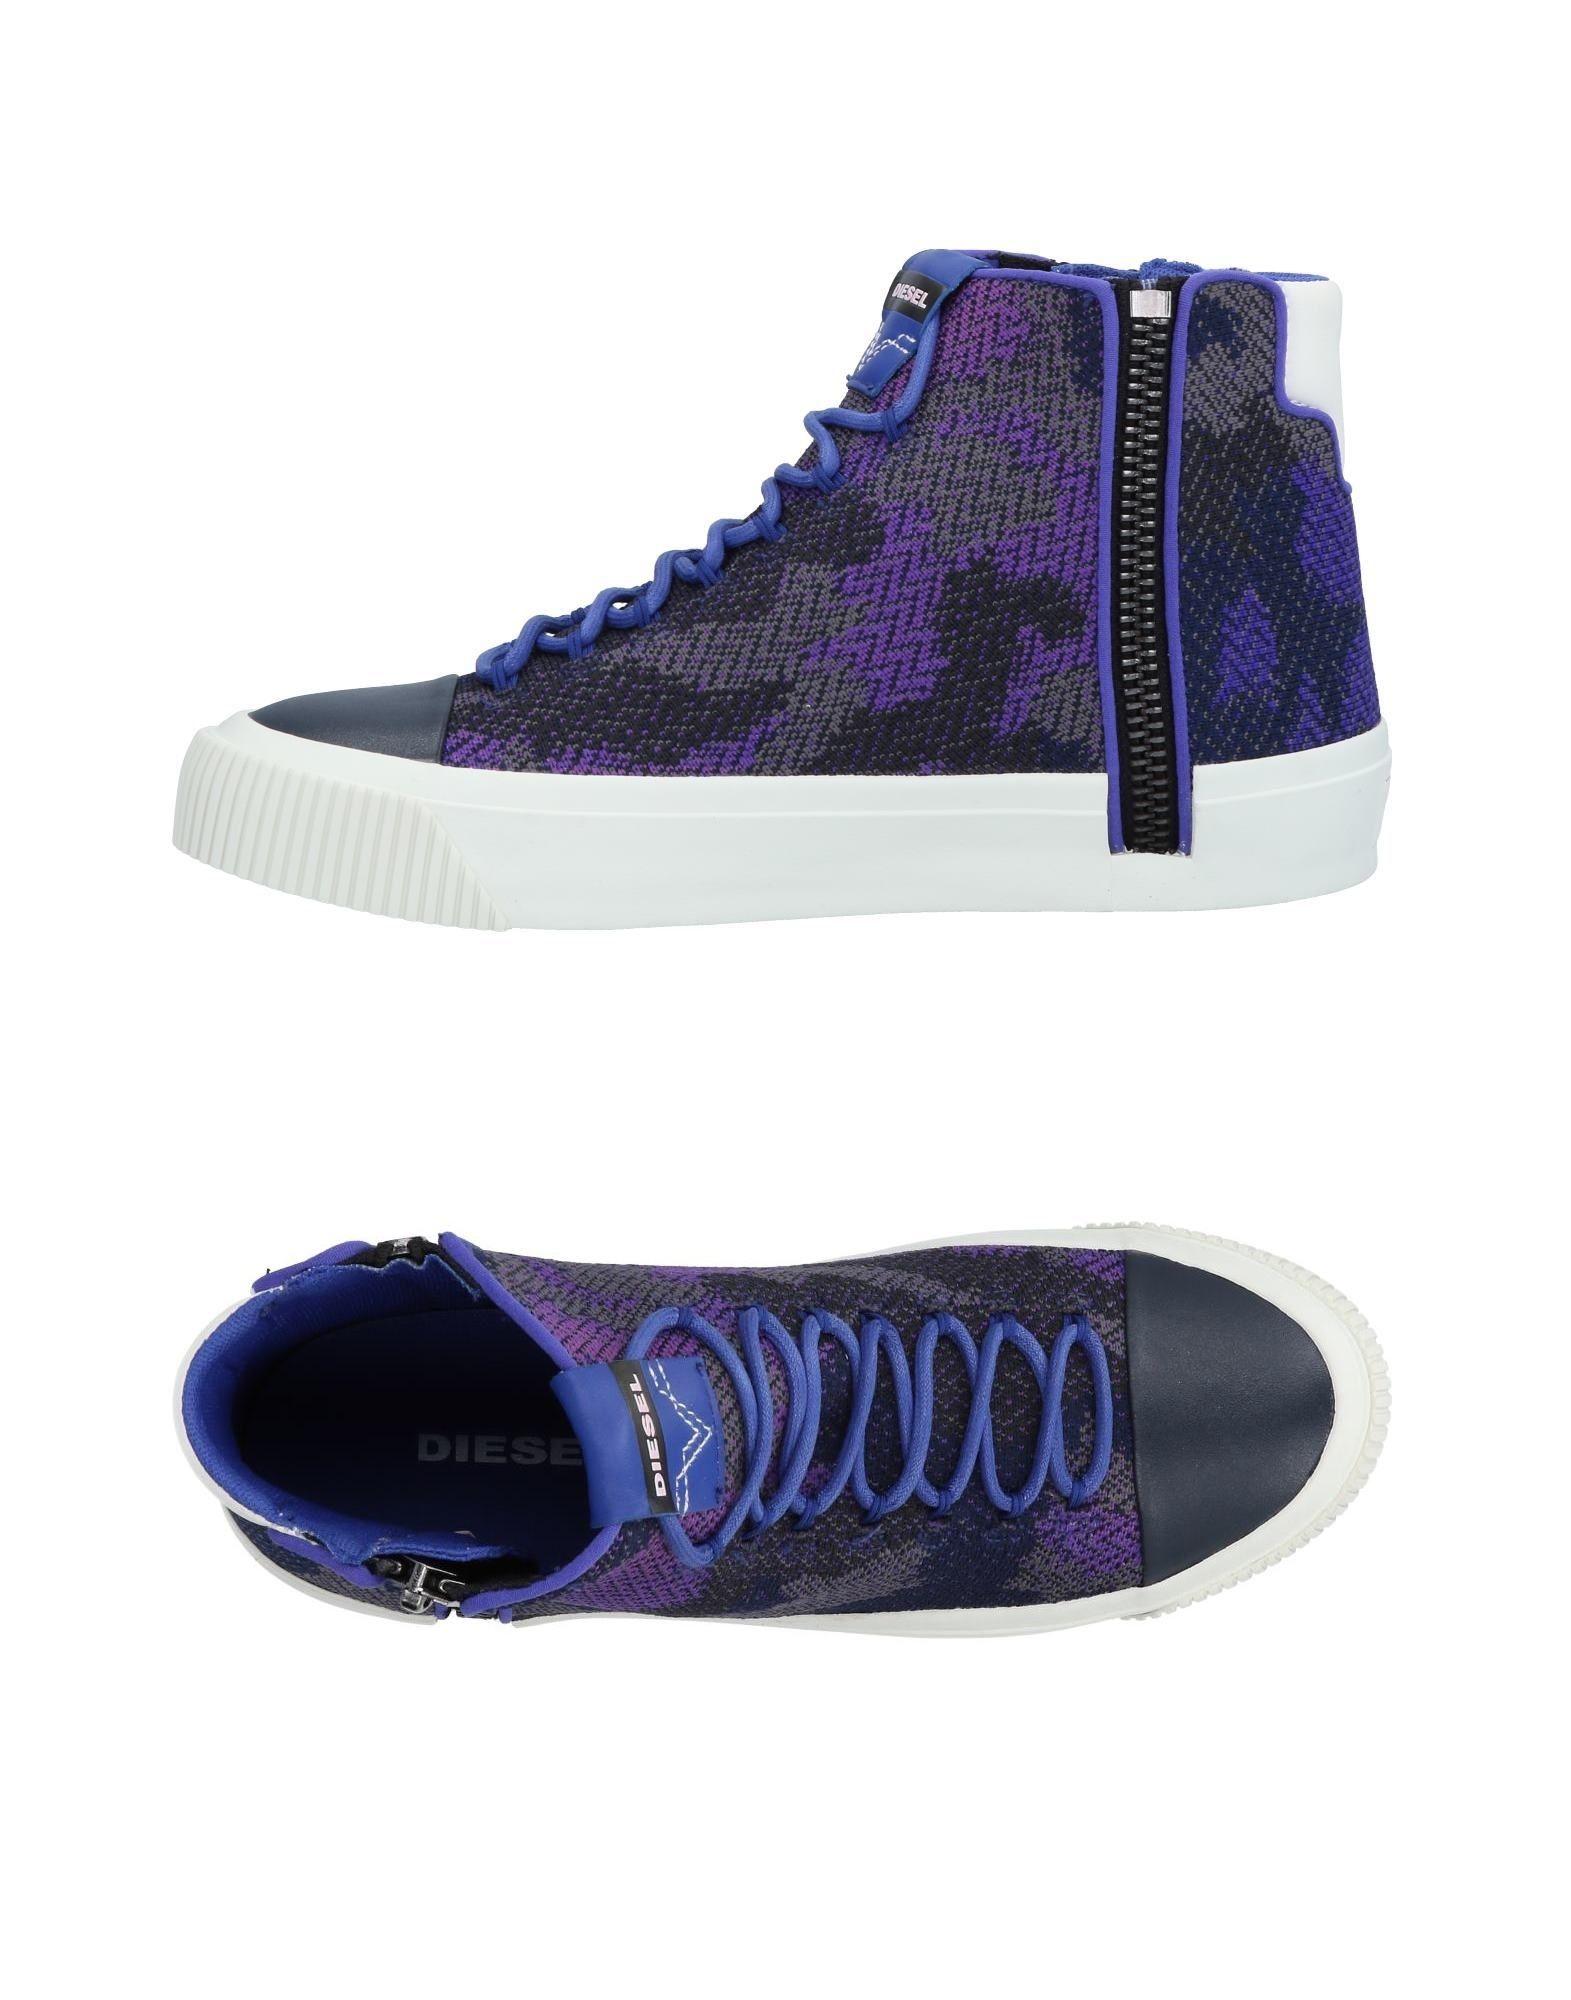 Rabatt echte Schuhe Diesel  Sneakers Herren  Diesel 11491336QG 5a68bd